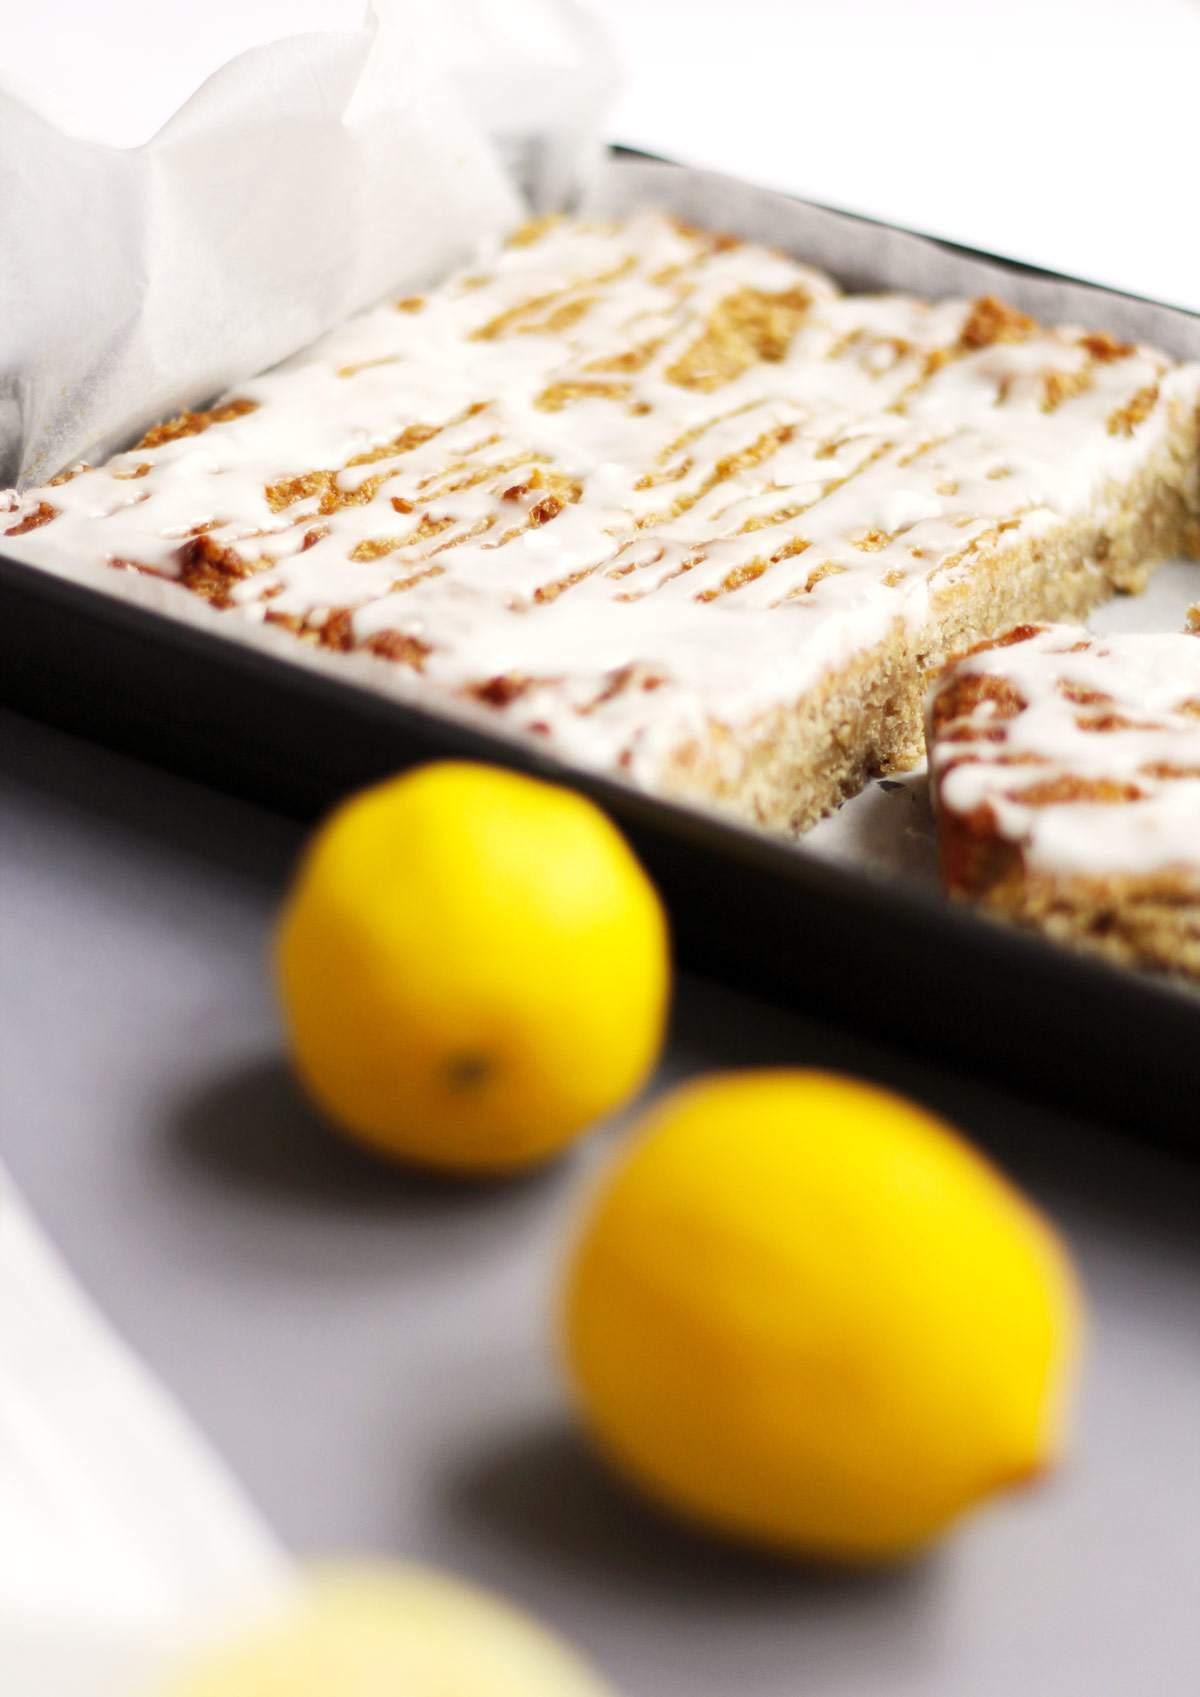 lemon-drizzle-flapjack-graze-spring-dessert-breakfast-lemon-curd-icing